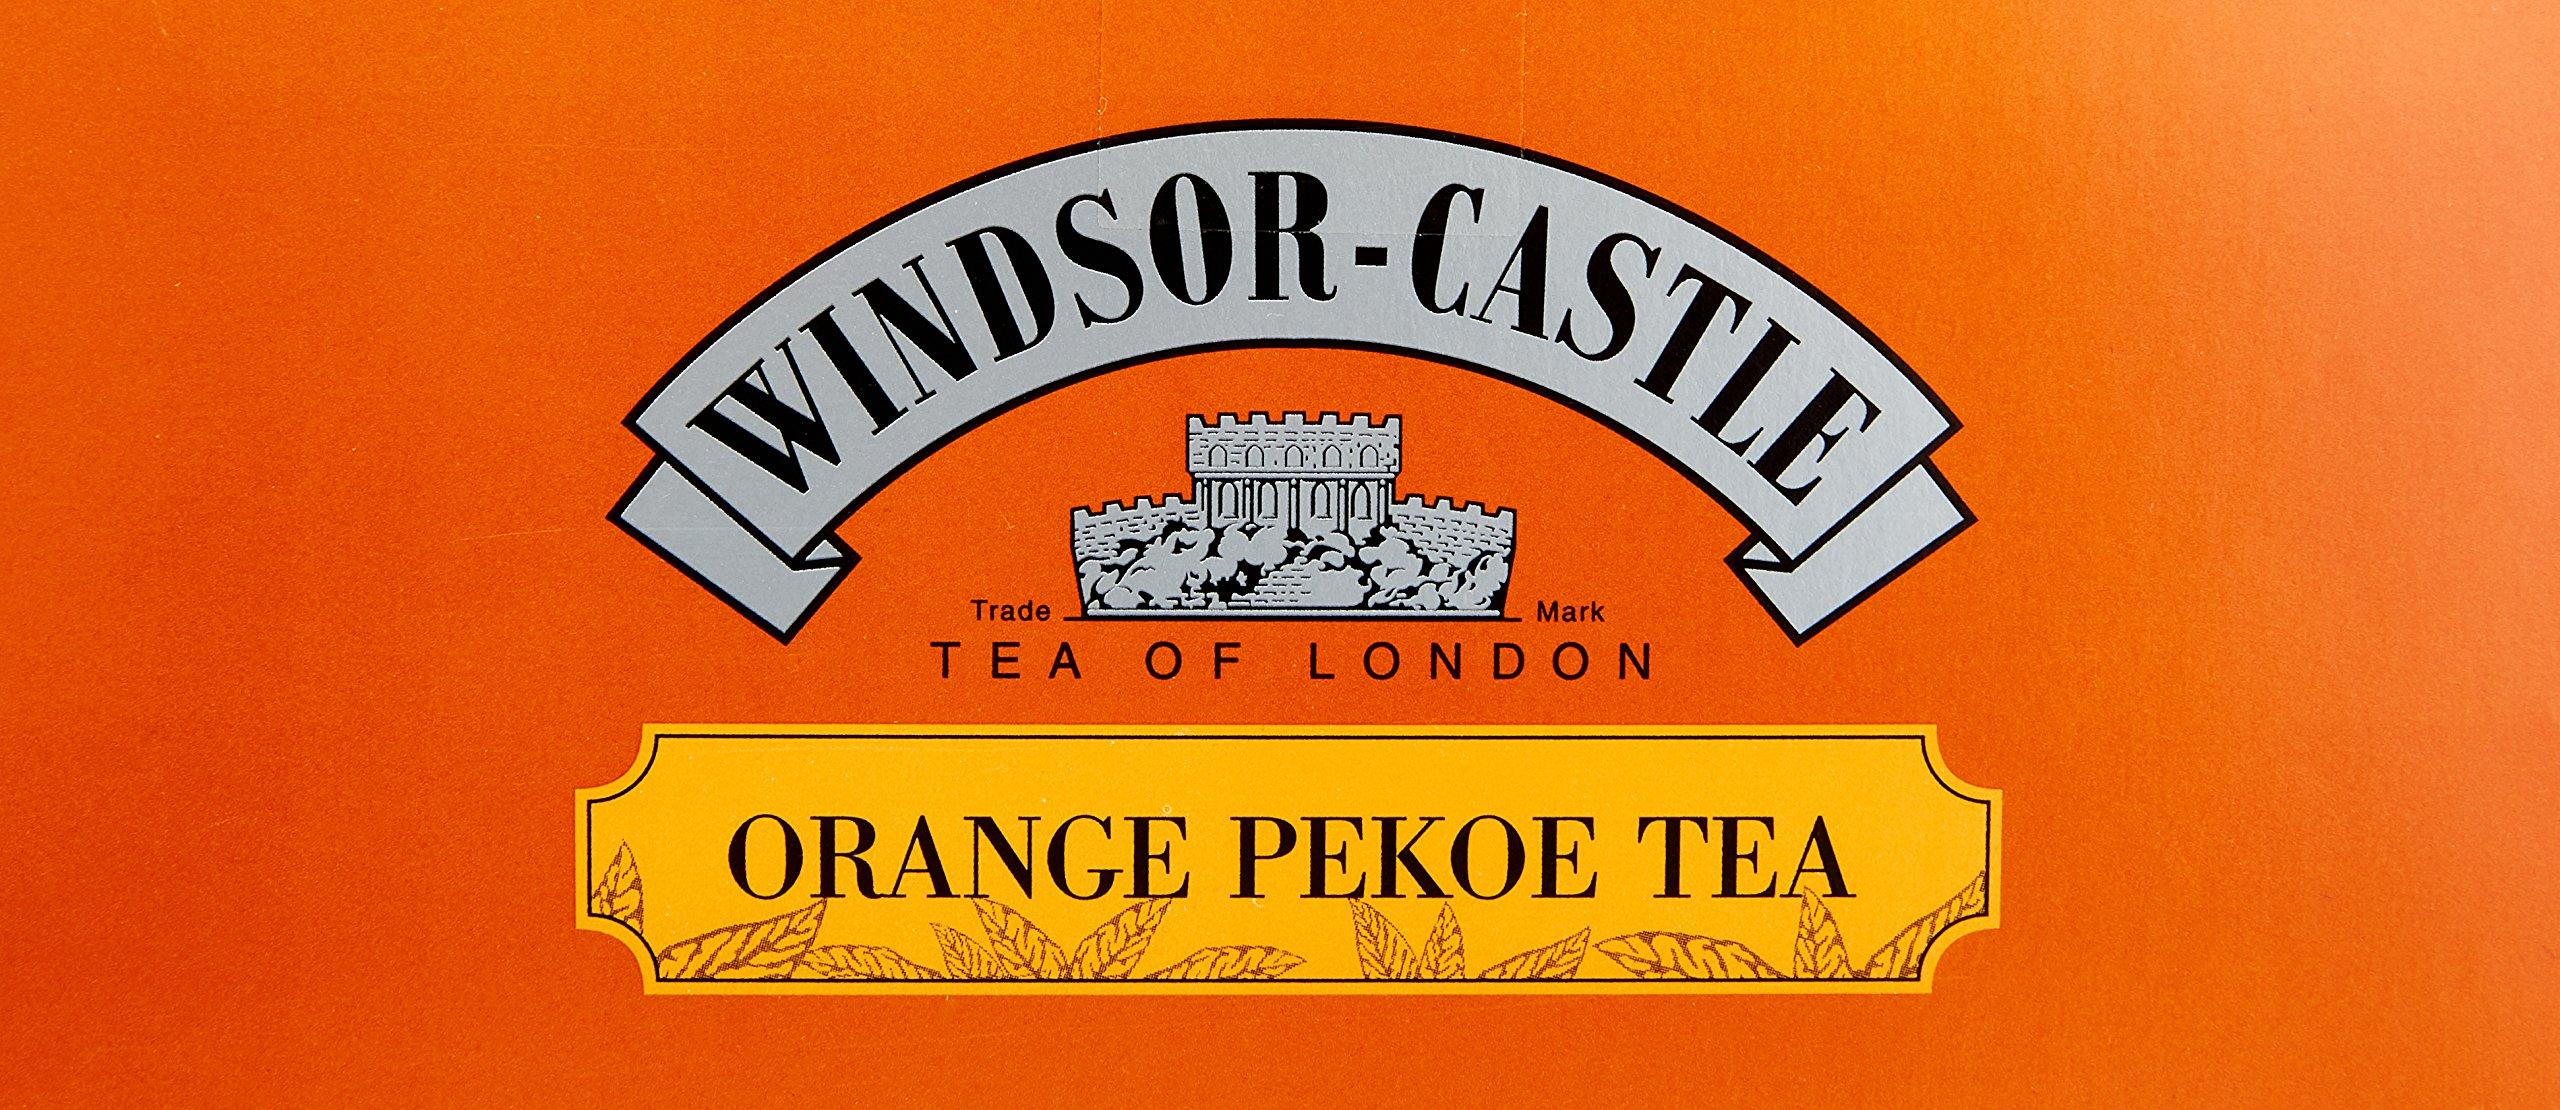 Windsor-Castle-Orange-Pekoe-Tea-175-g